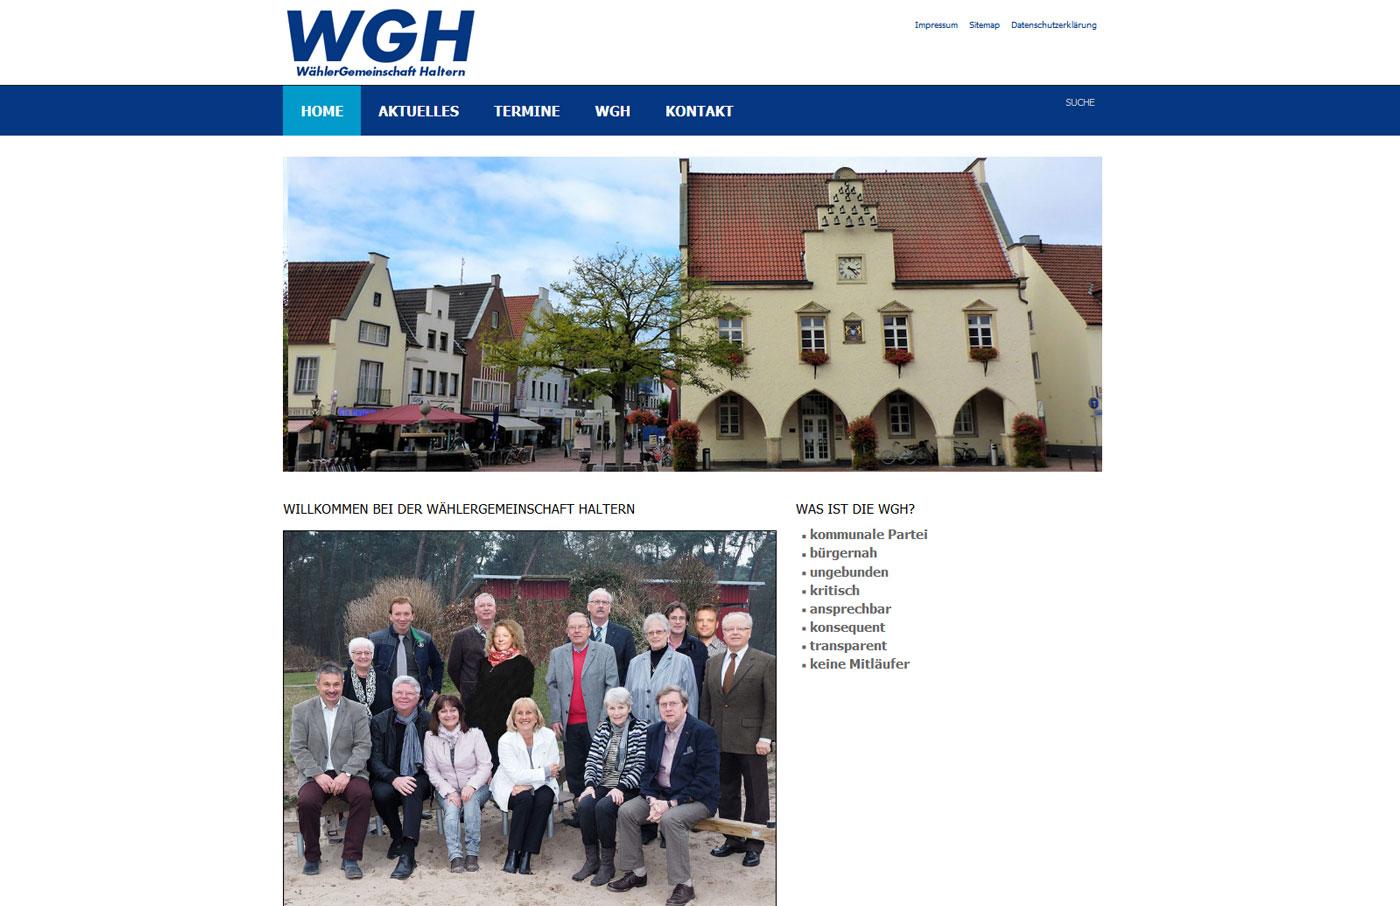 webseite-lokalpolitik.jpg